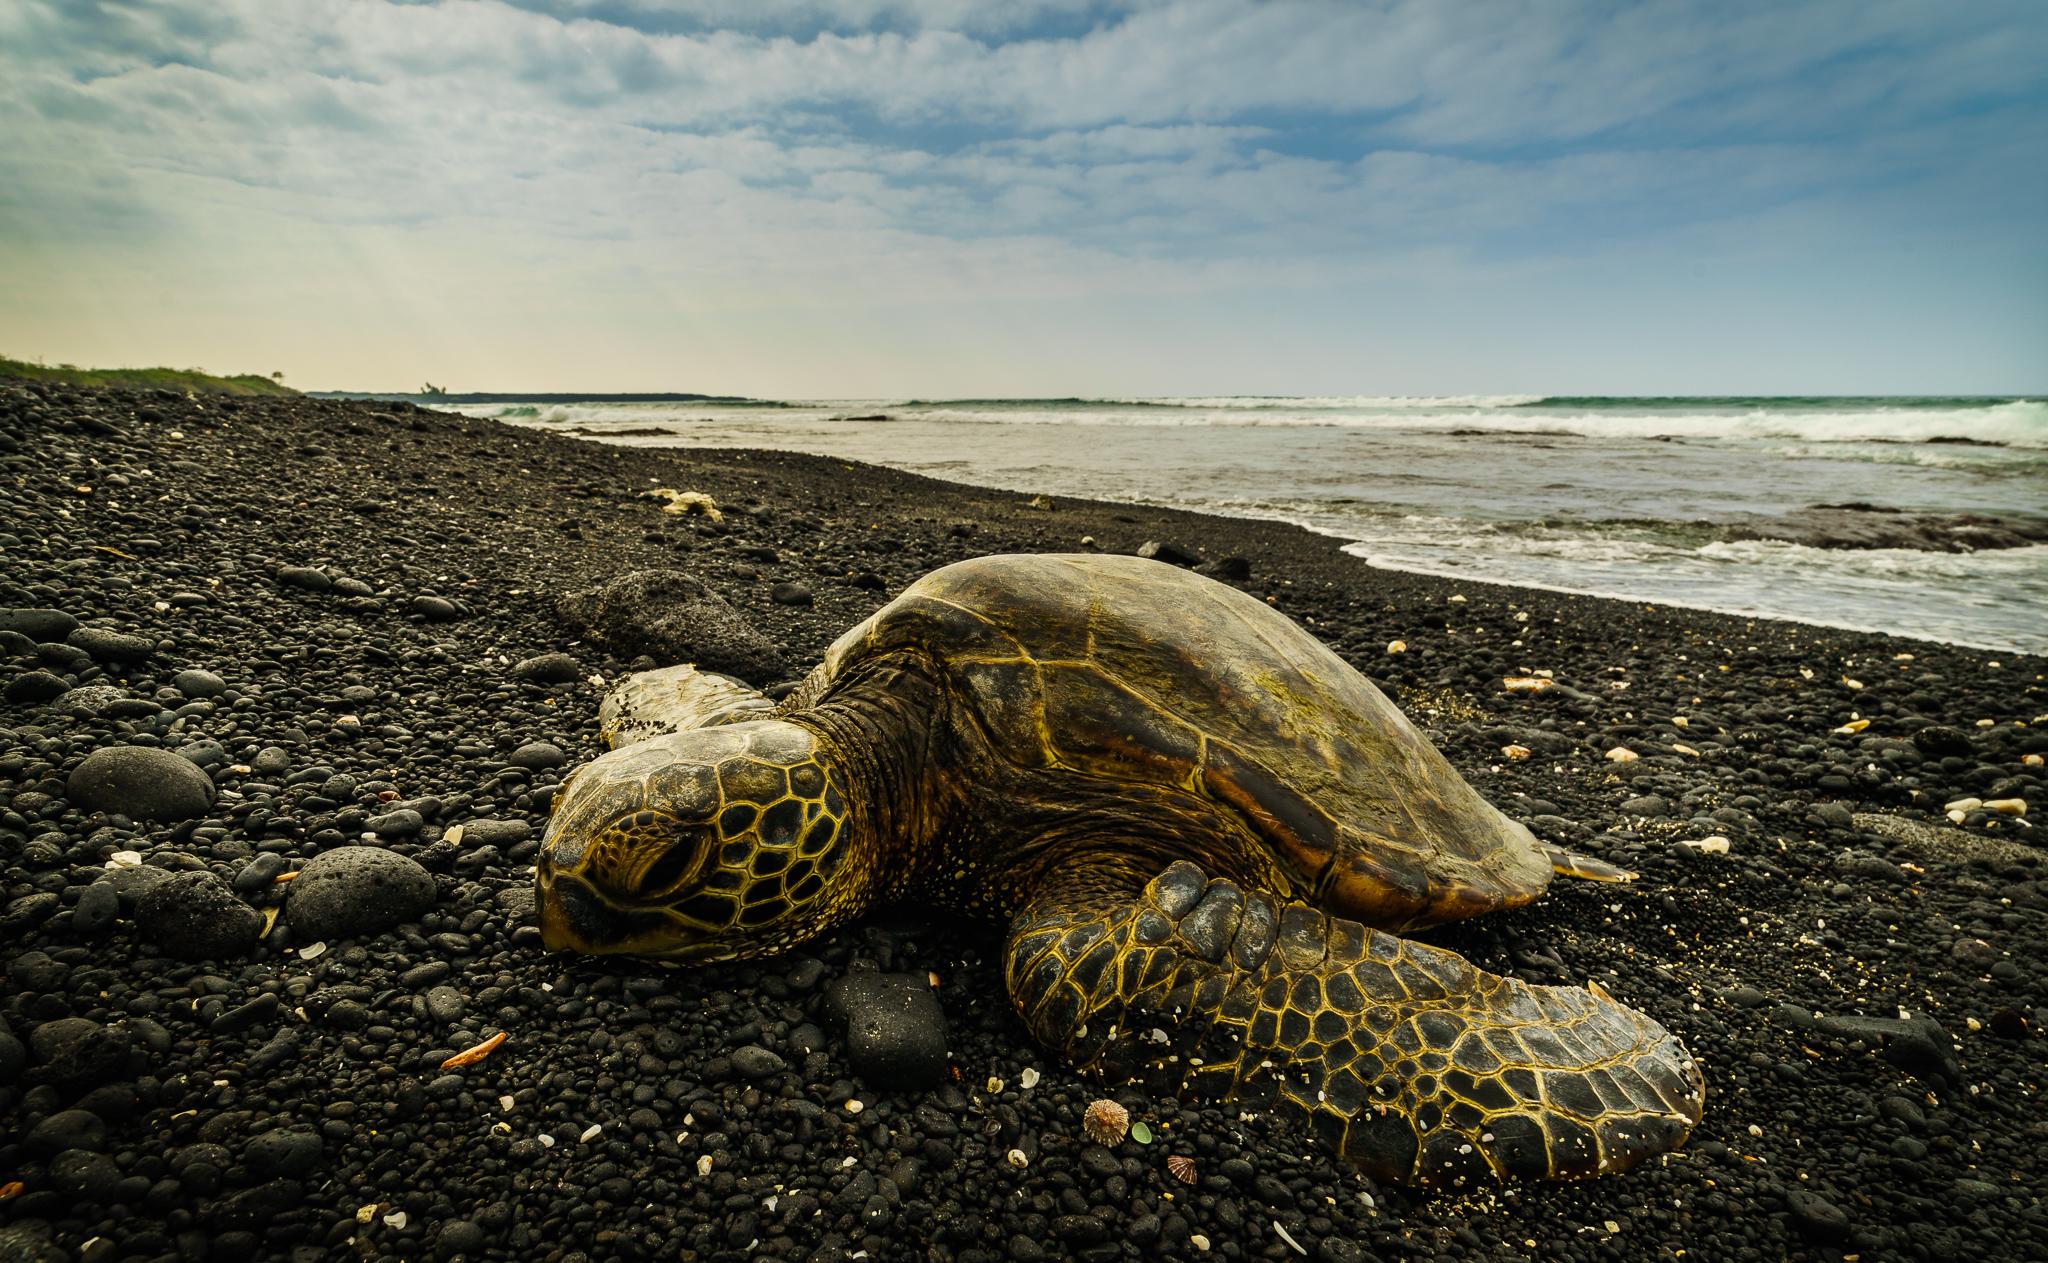 Kiholo Bay Turtles_003.jpg